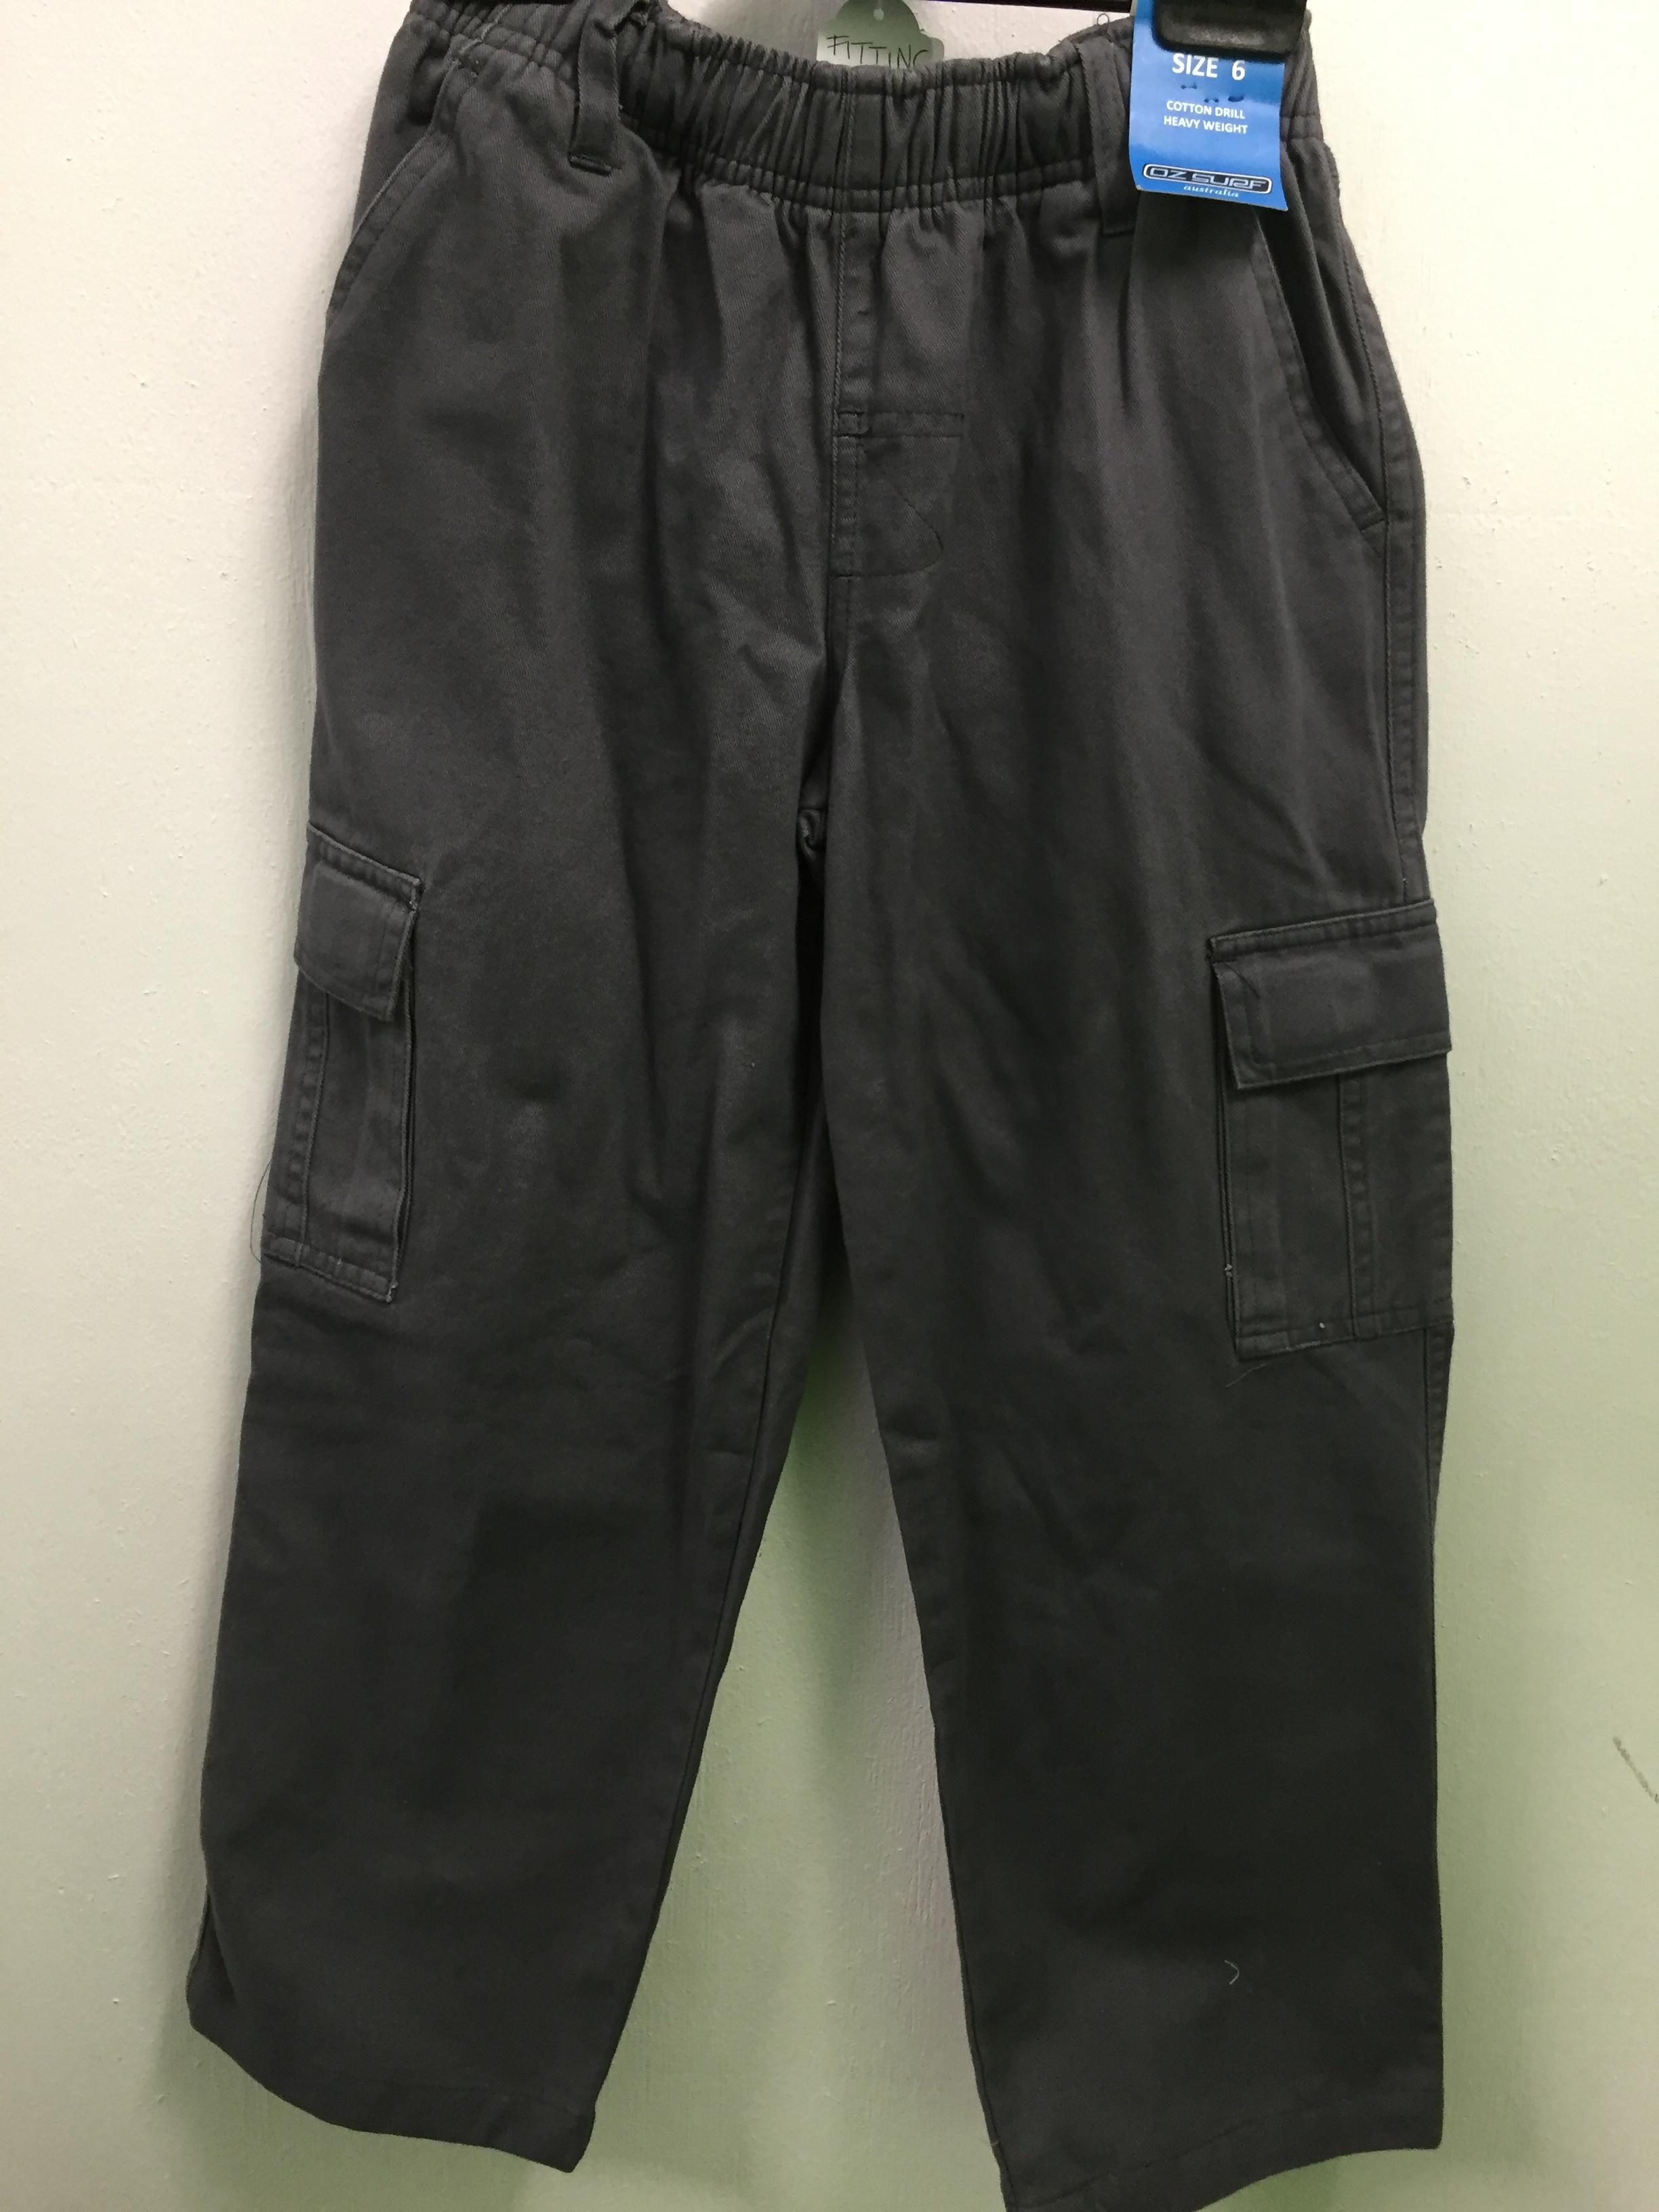 Oz Surf boys grey shorts